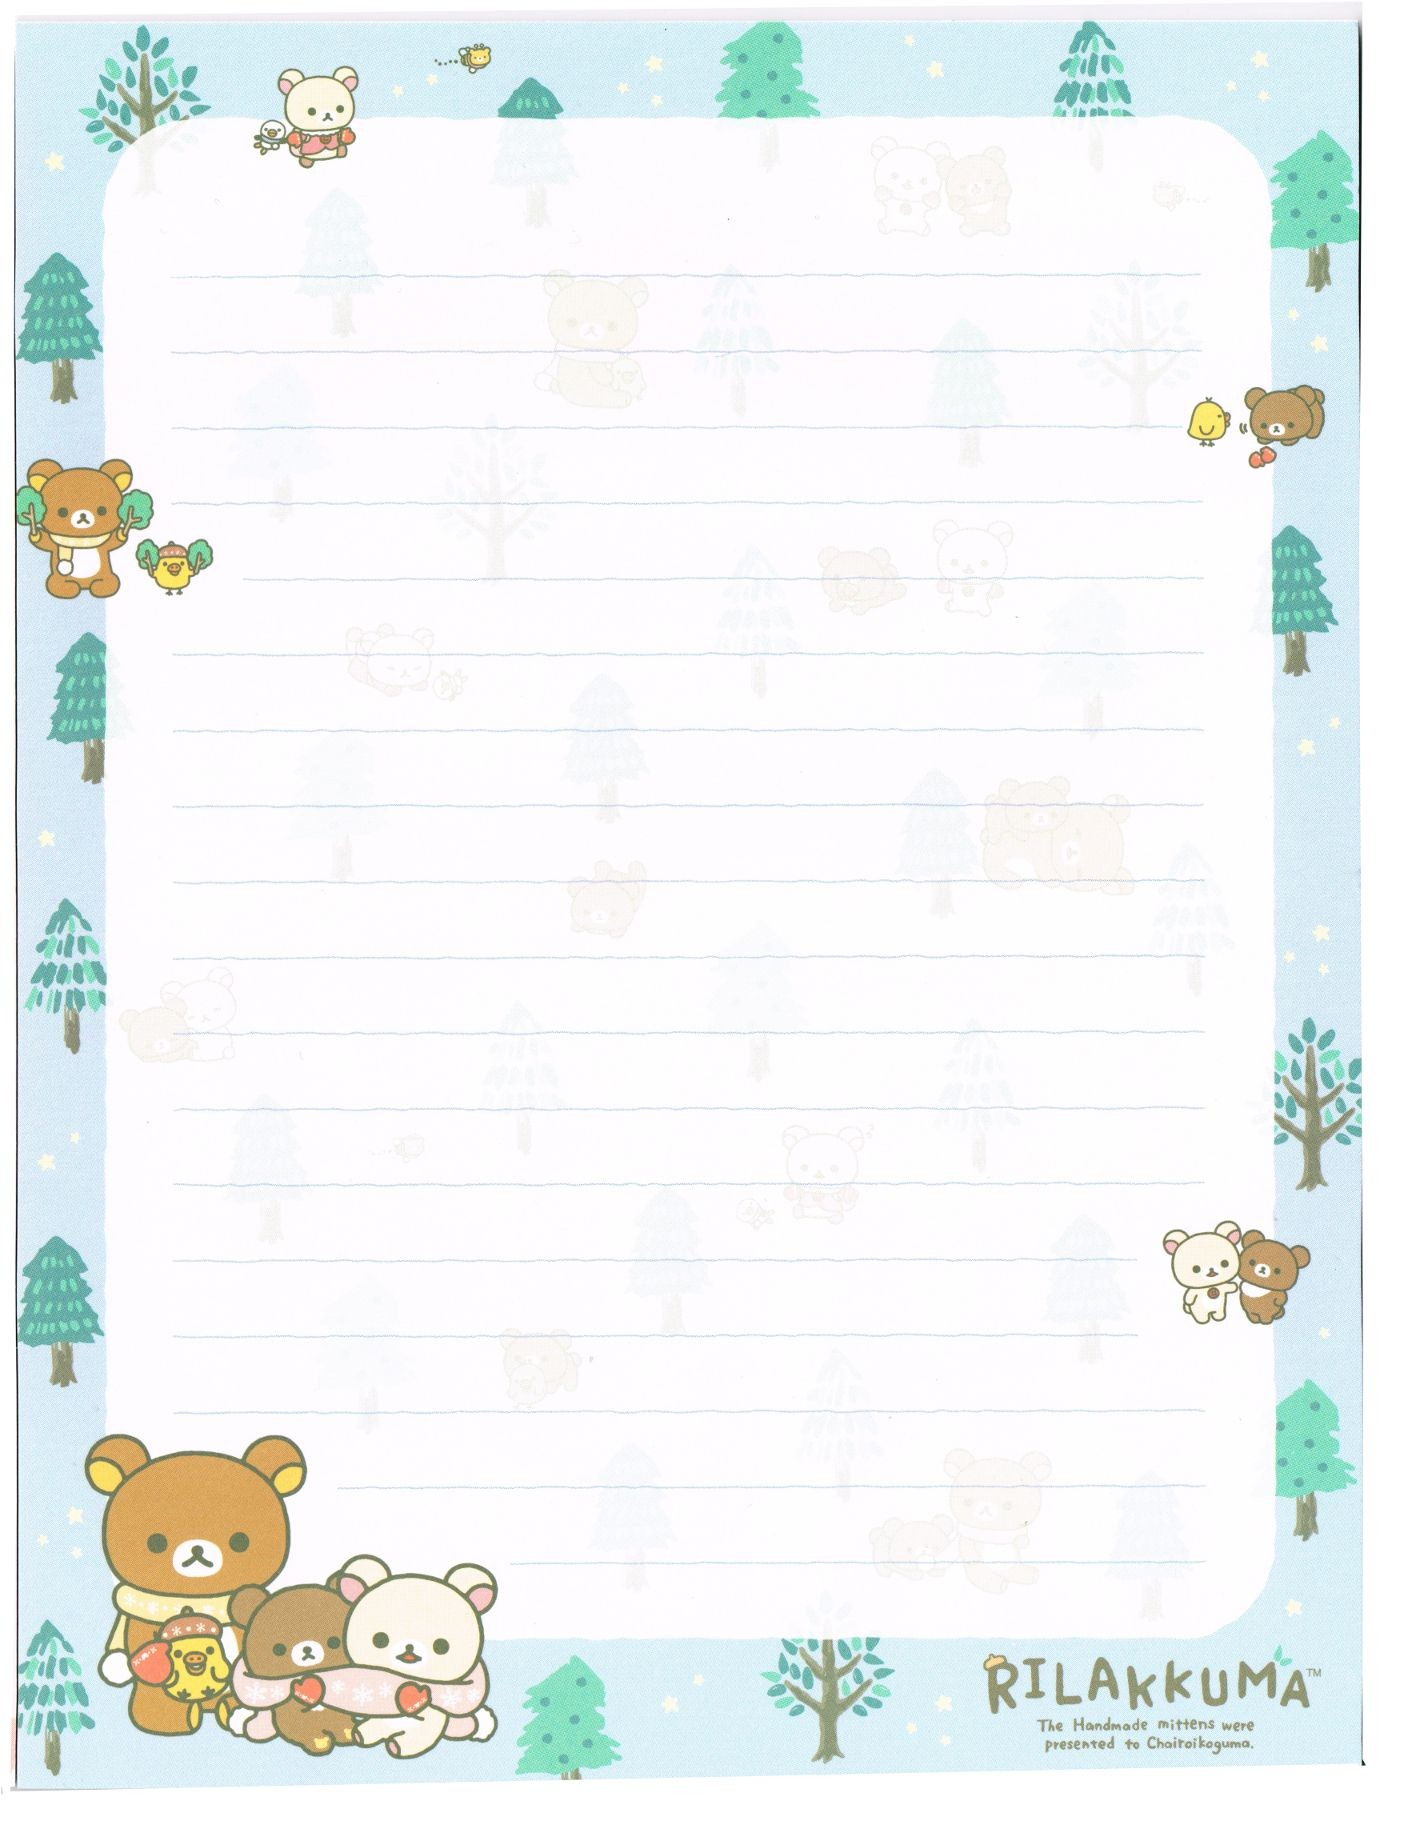 free printable winter Nordic forest writing memo pad sheet rilakkuma チロリアン